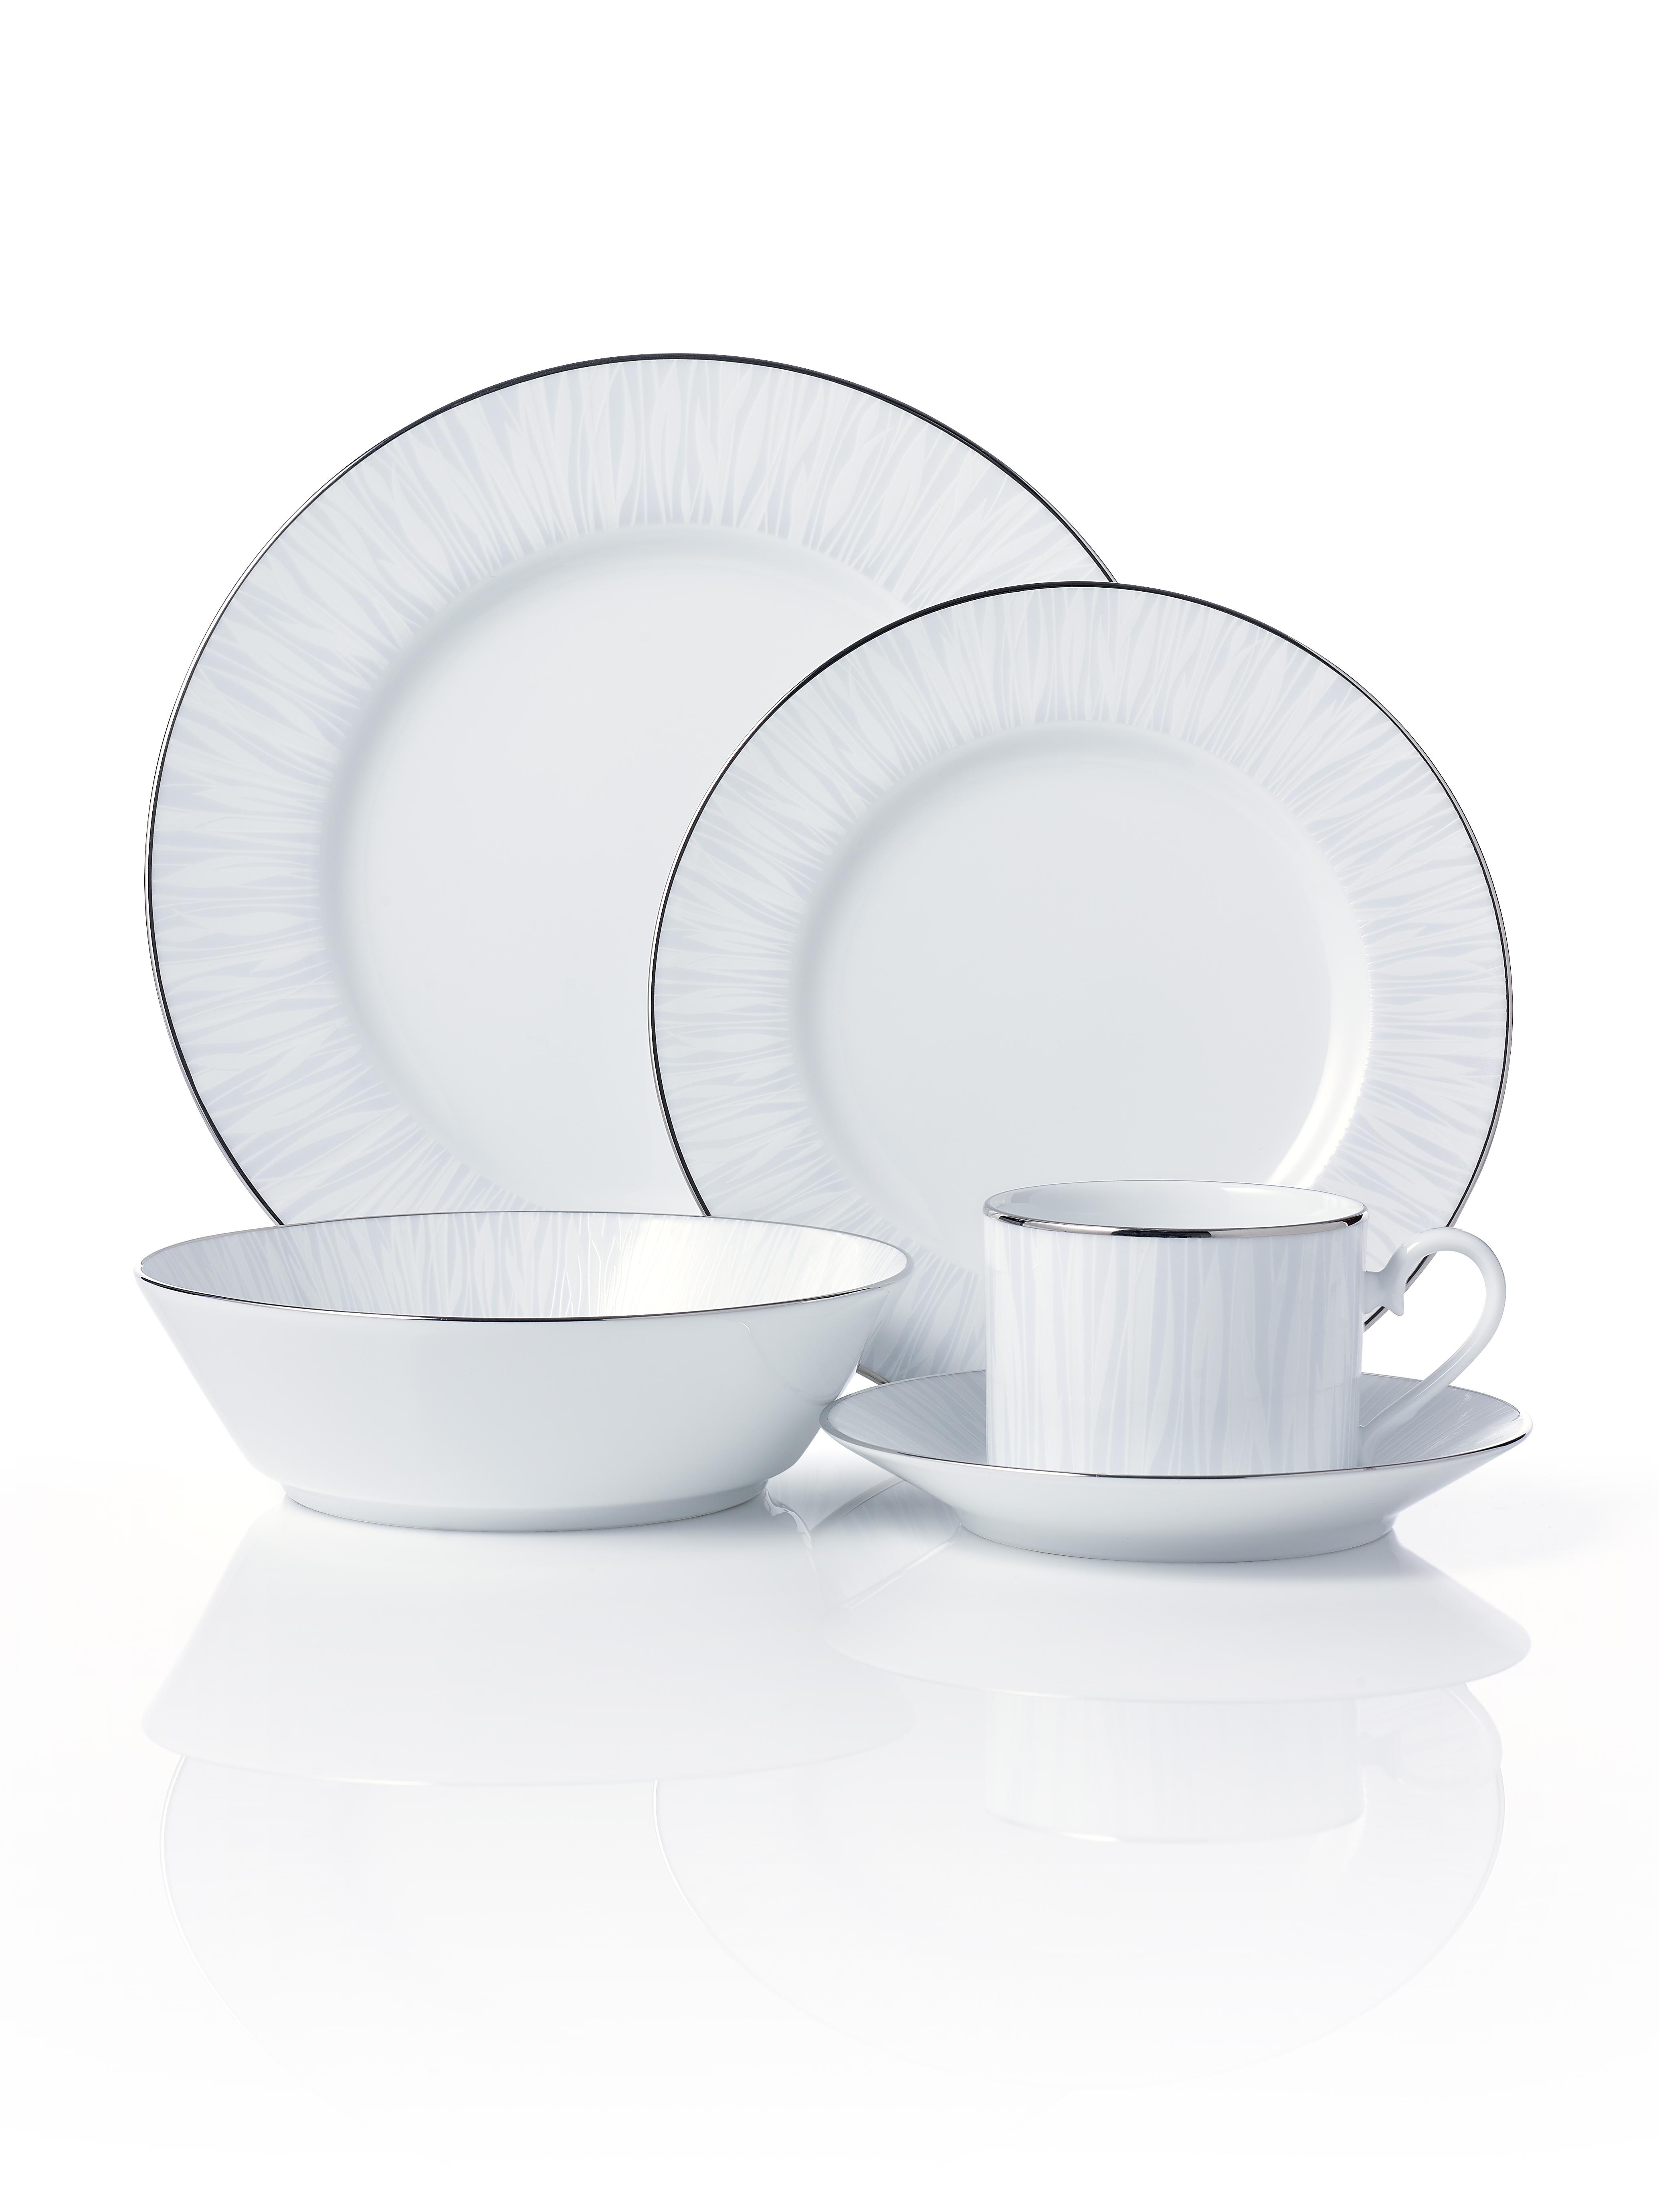 Glacier ...  sc 1 st  Noritake & Glacier Platinum 20pce Dinner Set - Noritake Australia Pty Ltd